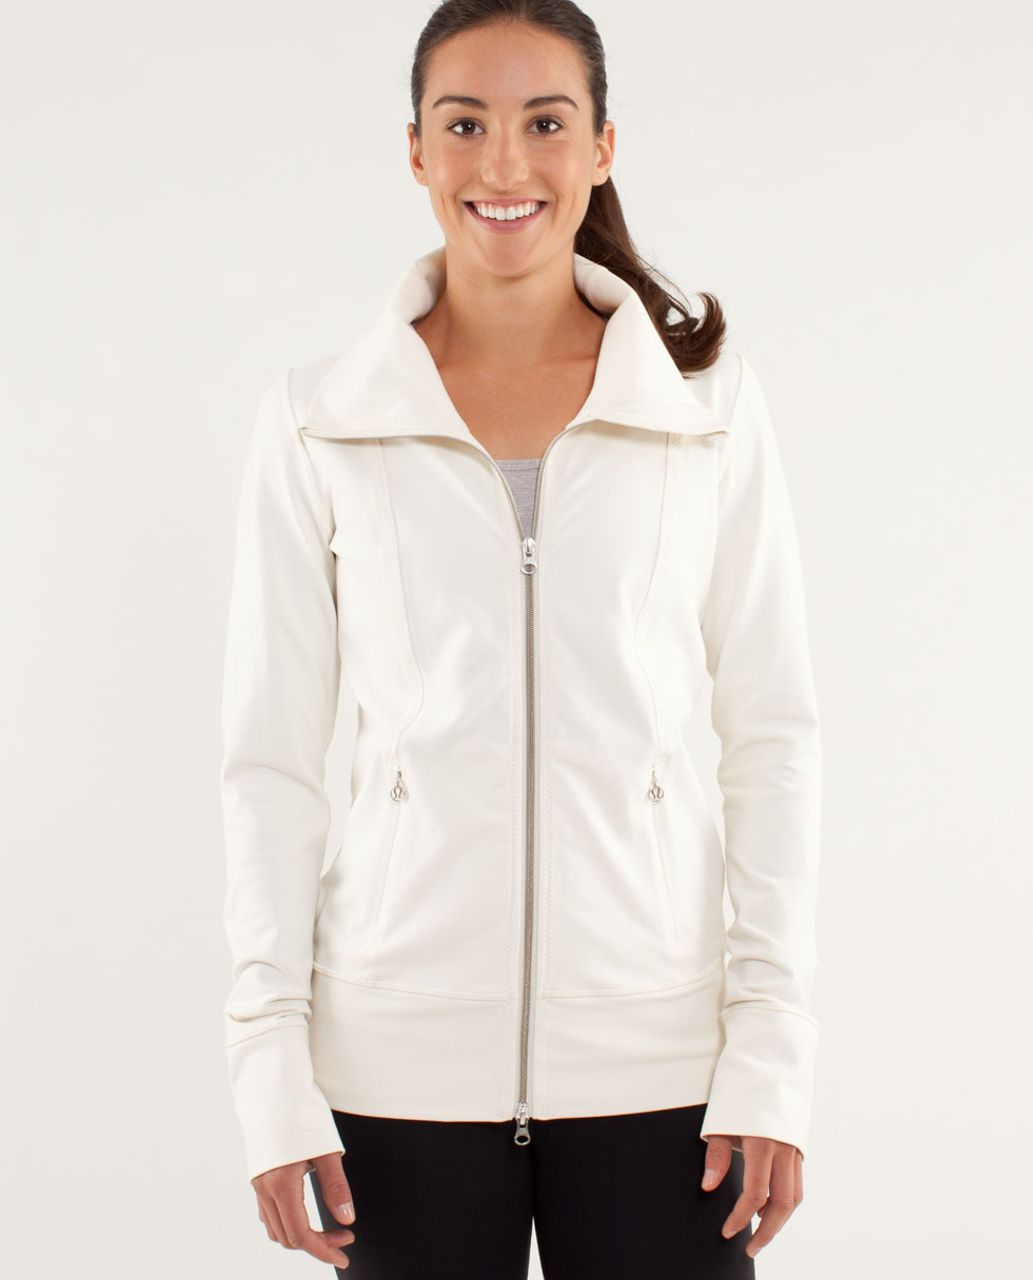 097fbbd9d0 Lululemon Daily Yoga Jacket - Polar Cream - lulu fanatics